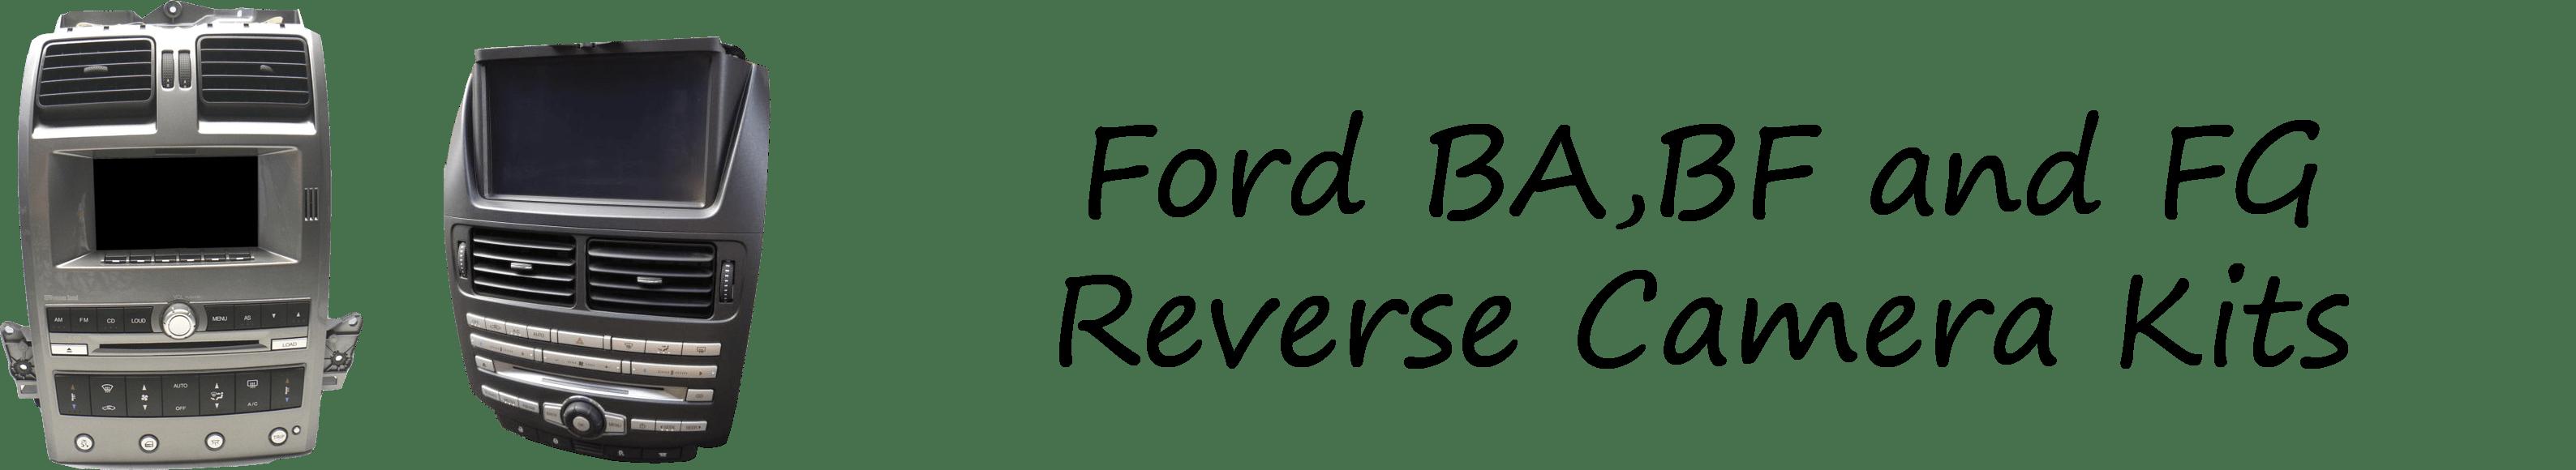 ba-bf-fg-reverse-camera-kit-banner